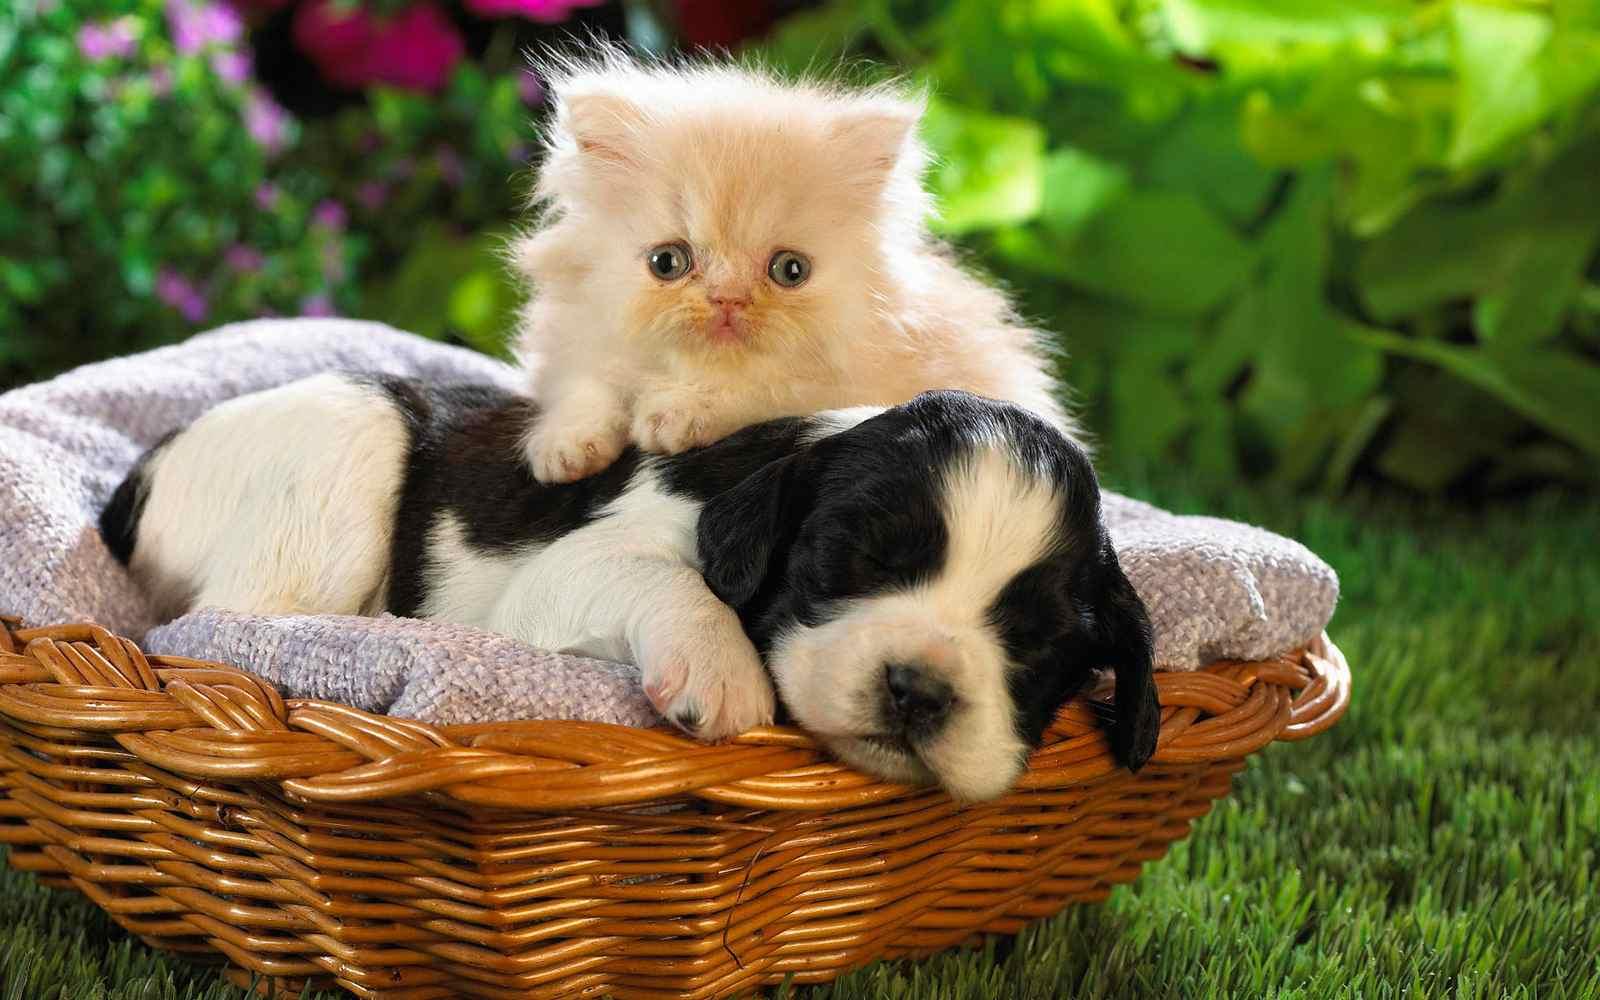 Cute Puppies Kittens Hd Wallpaper Best HD Wallpapers 1600x1000